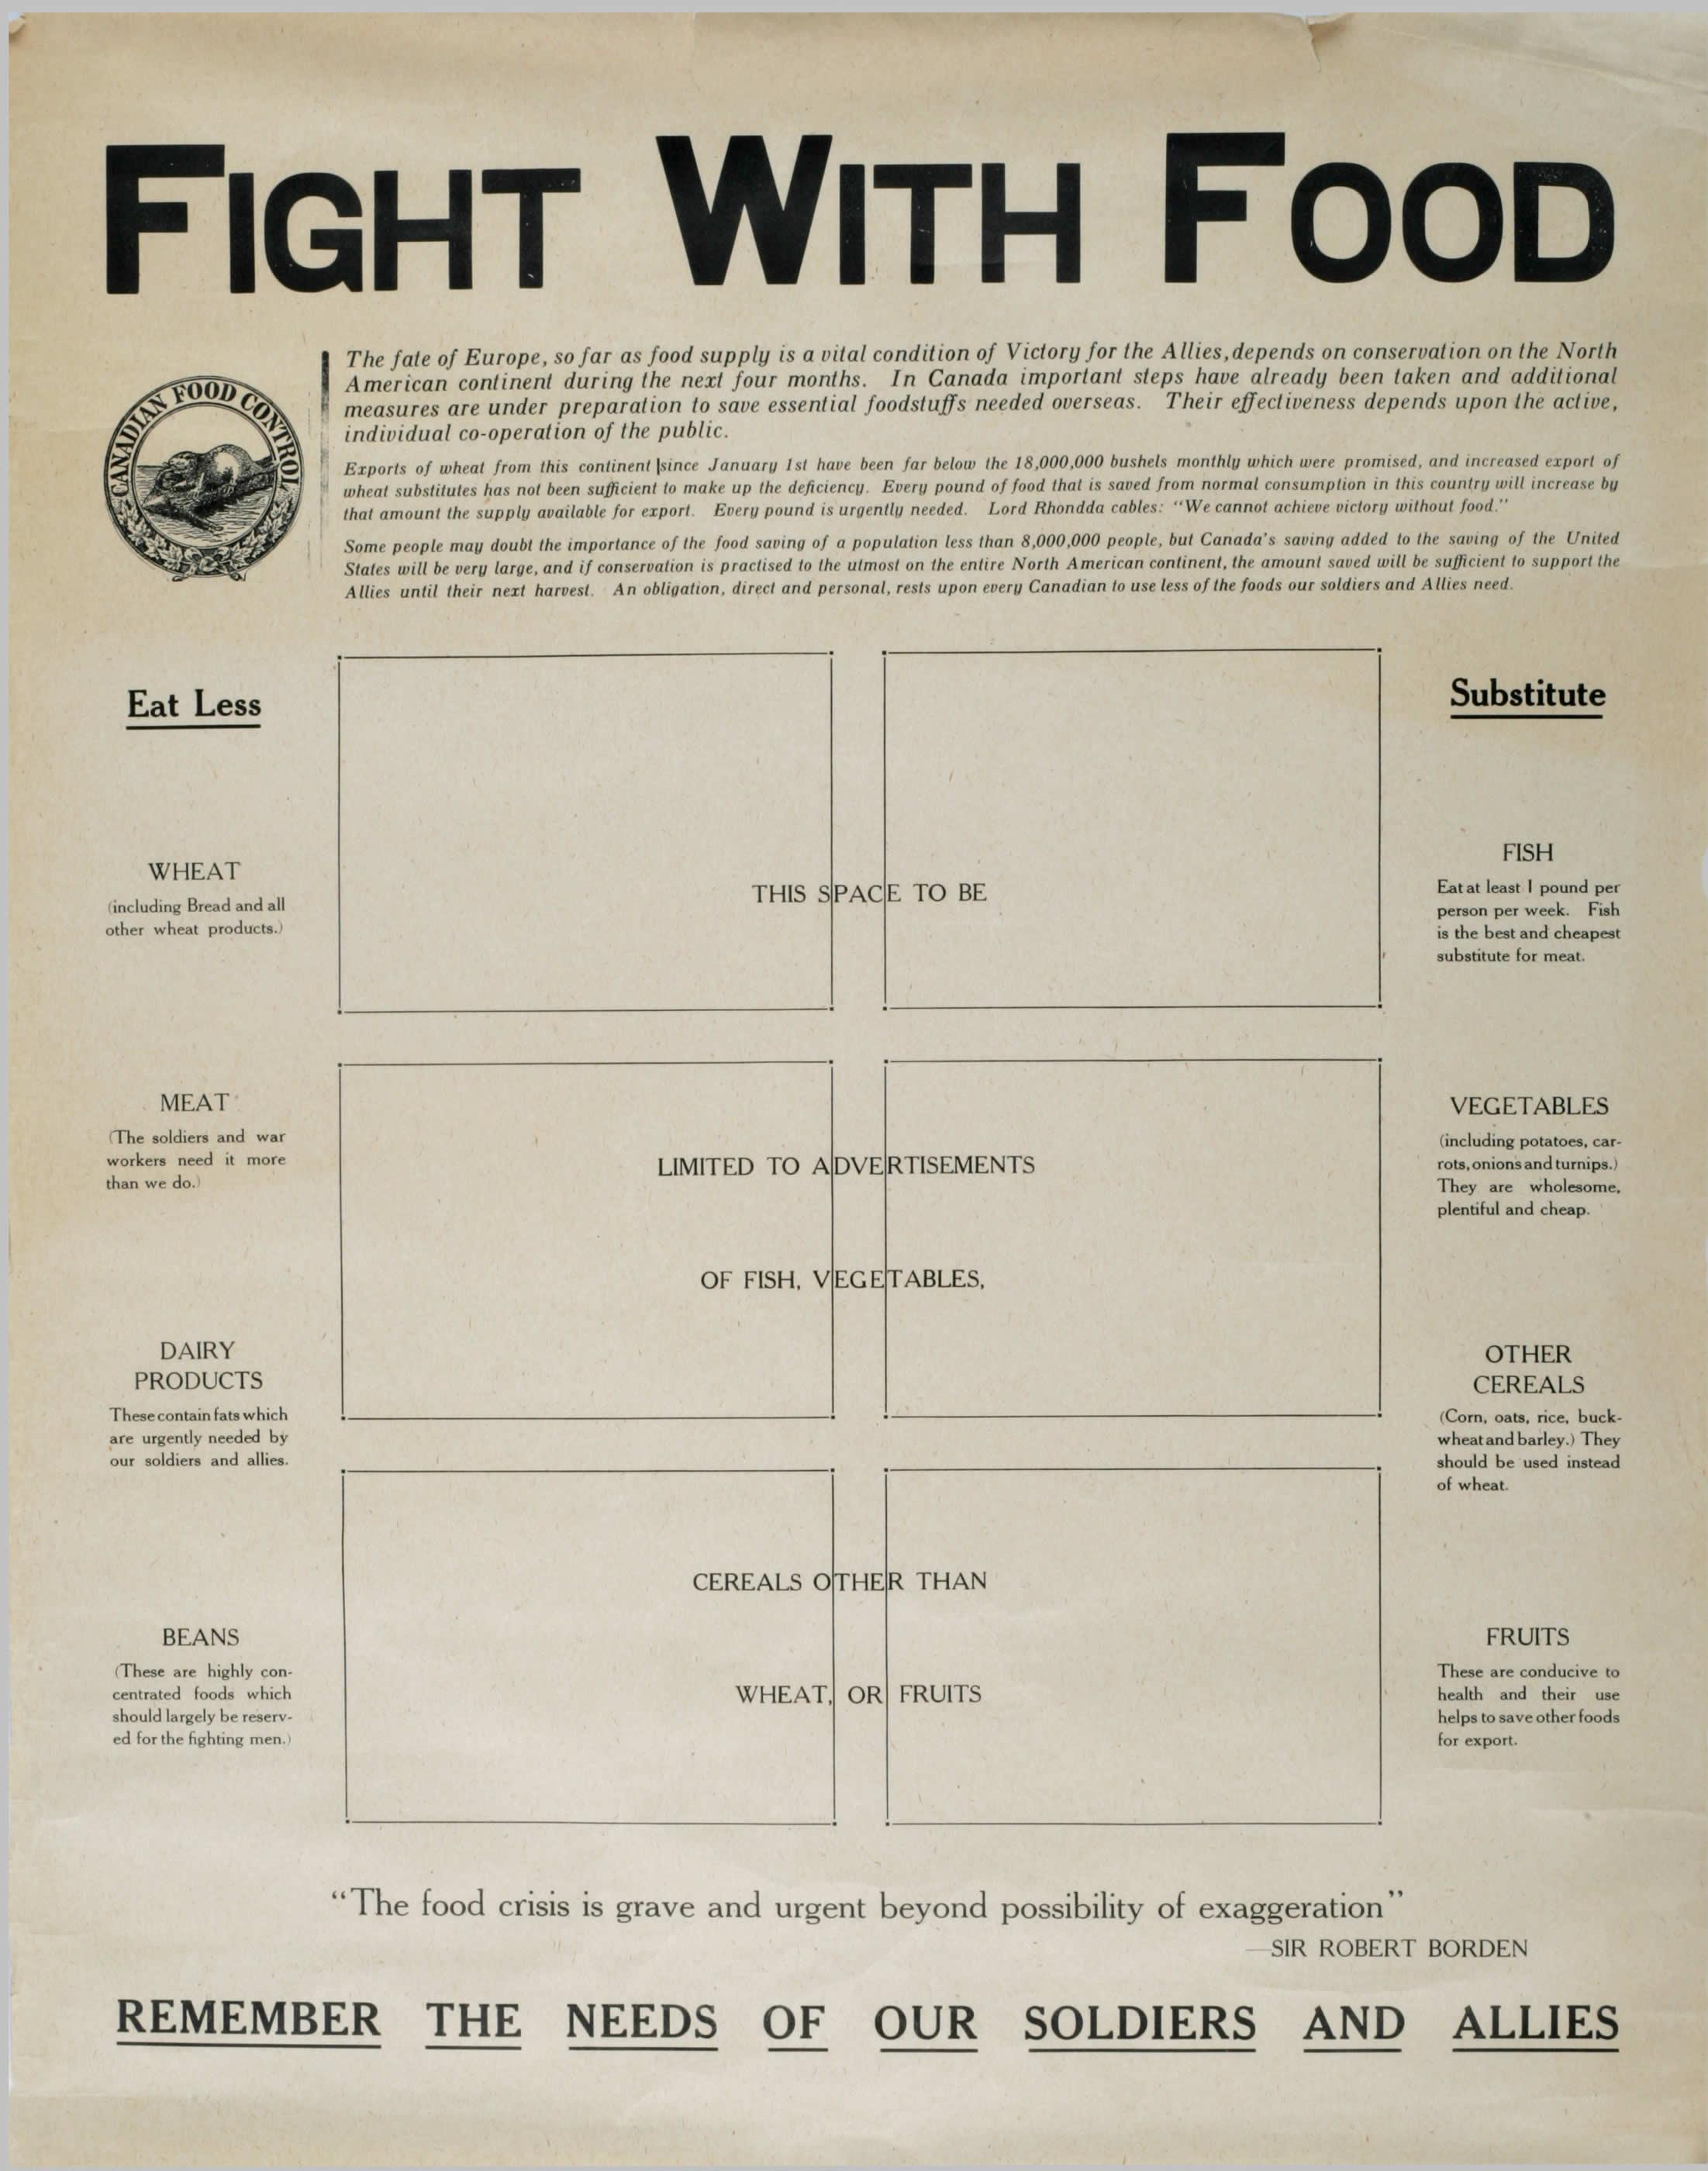 <i>Fight with Food (Combattez avec des aliments)</i>